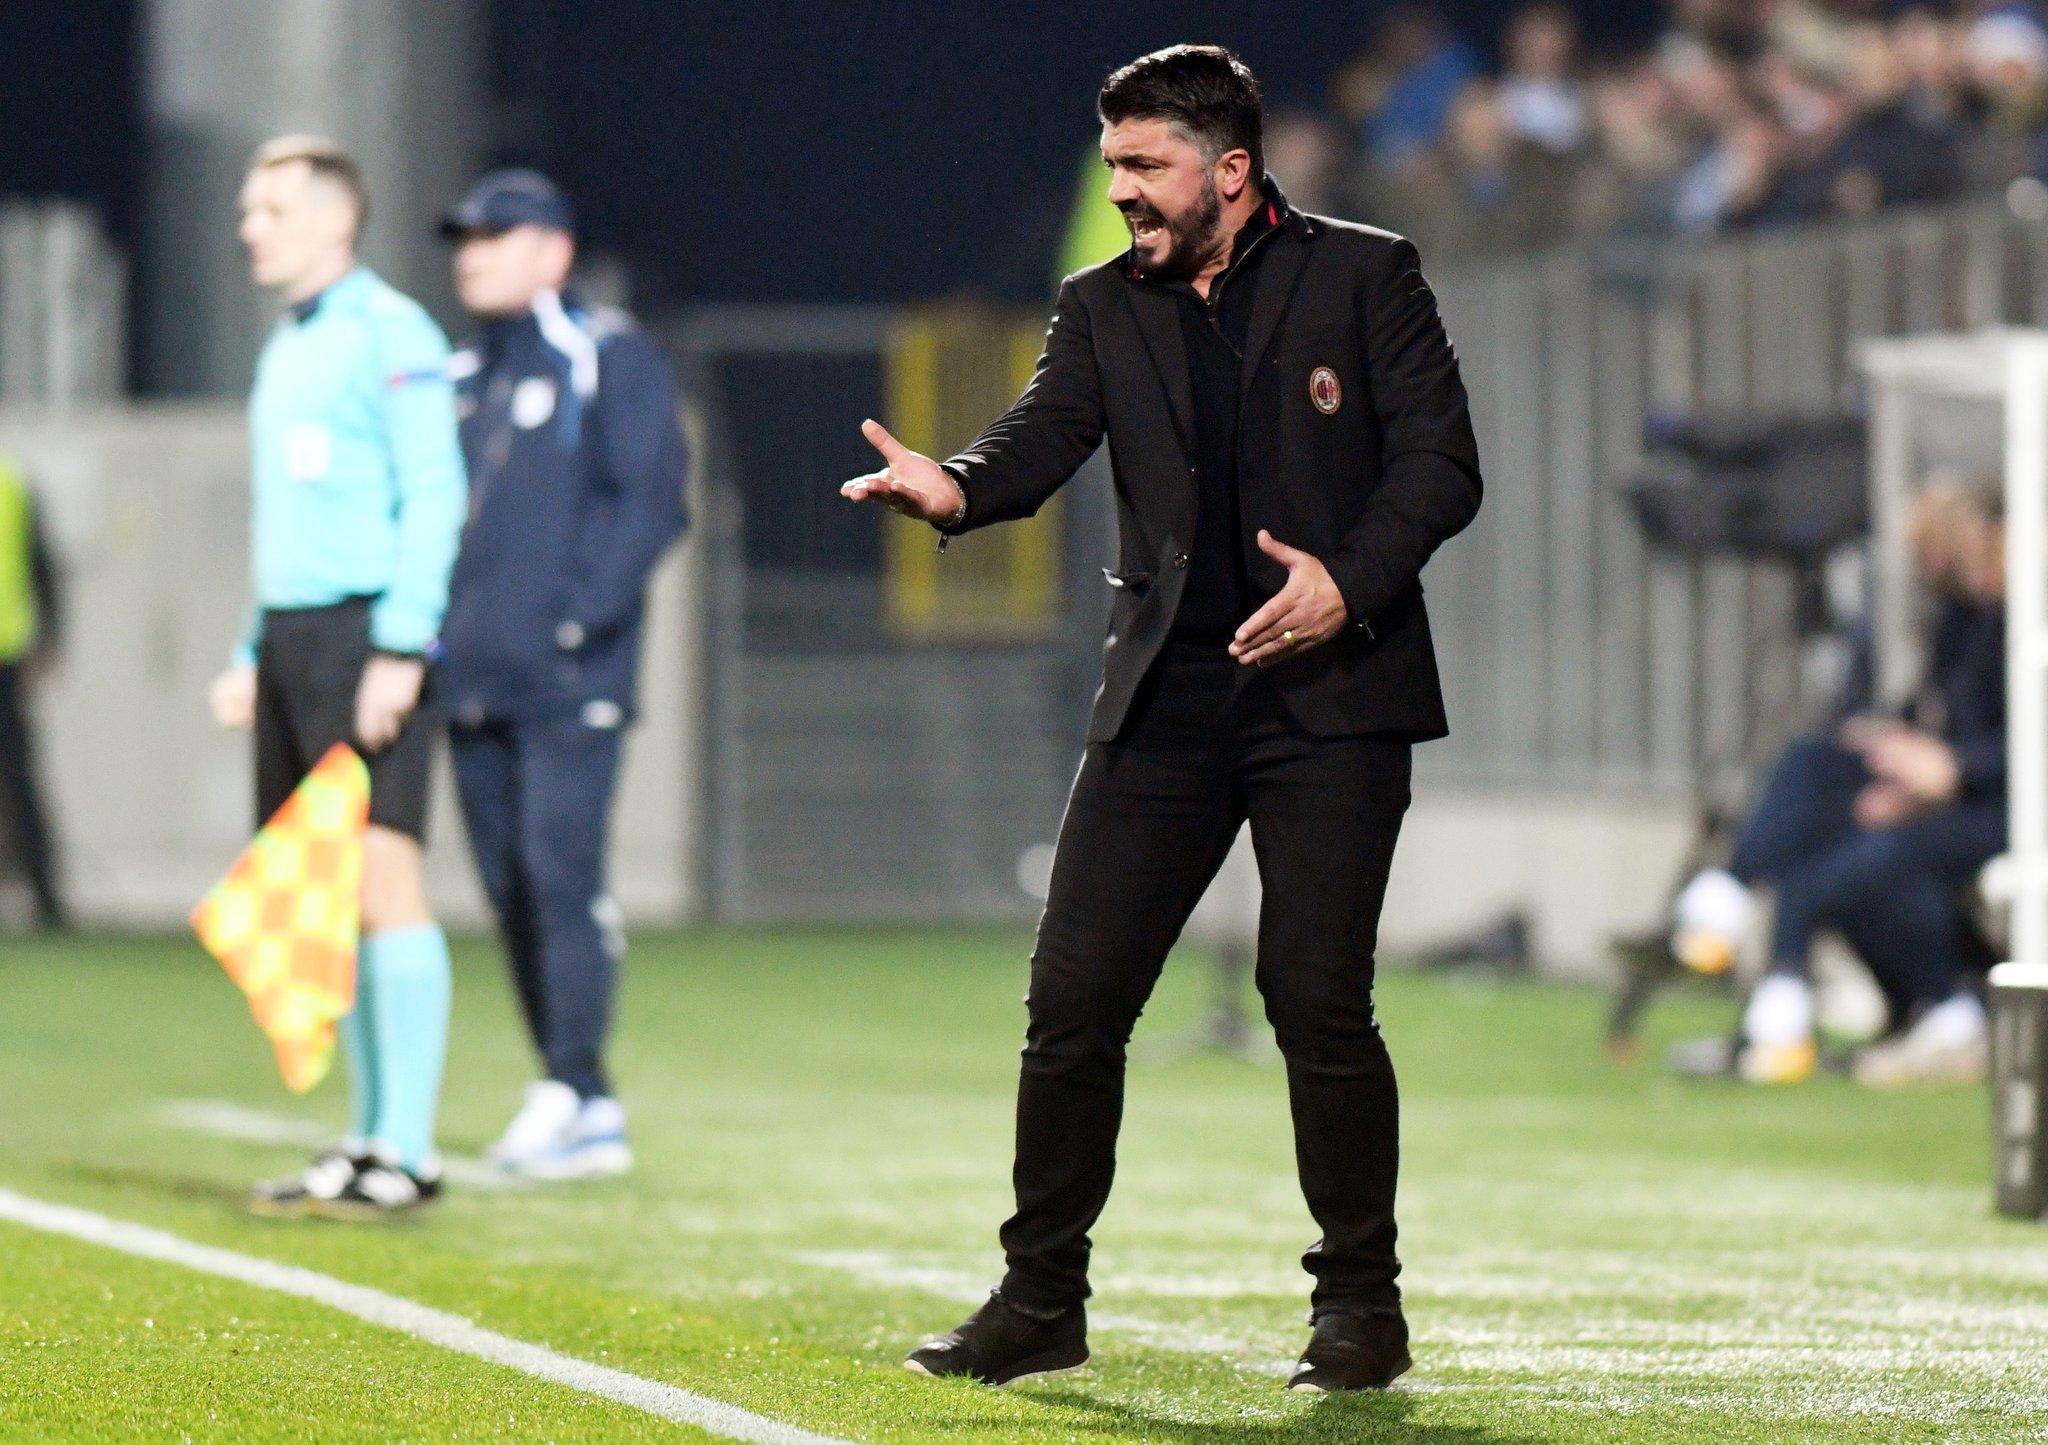 Риека го посрамоти Рино и Милан